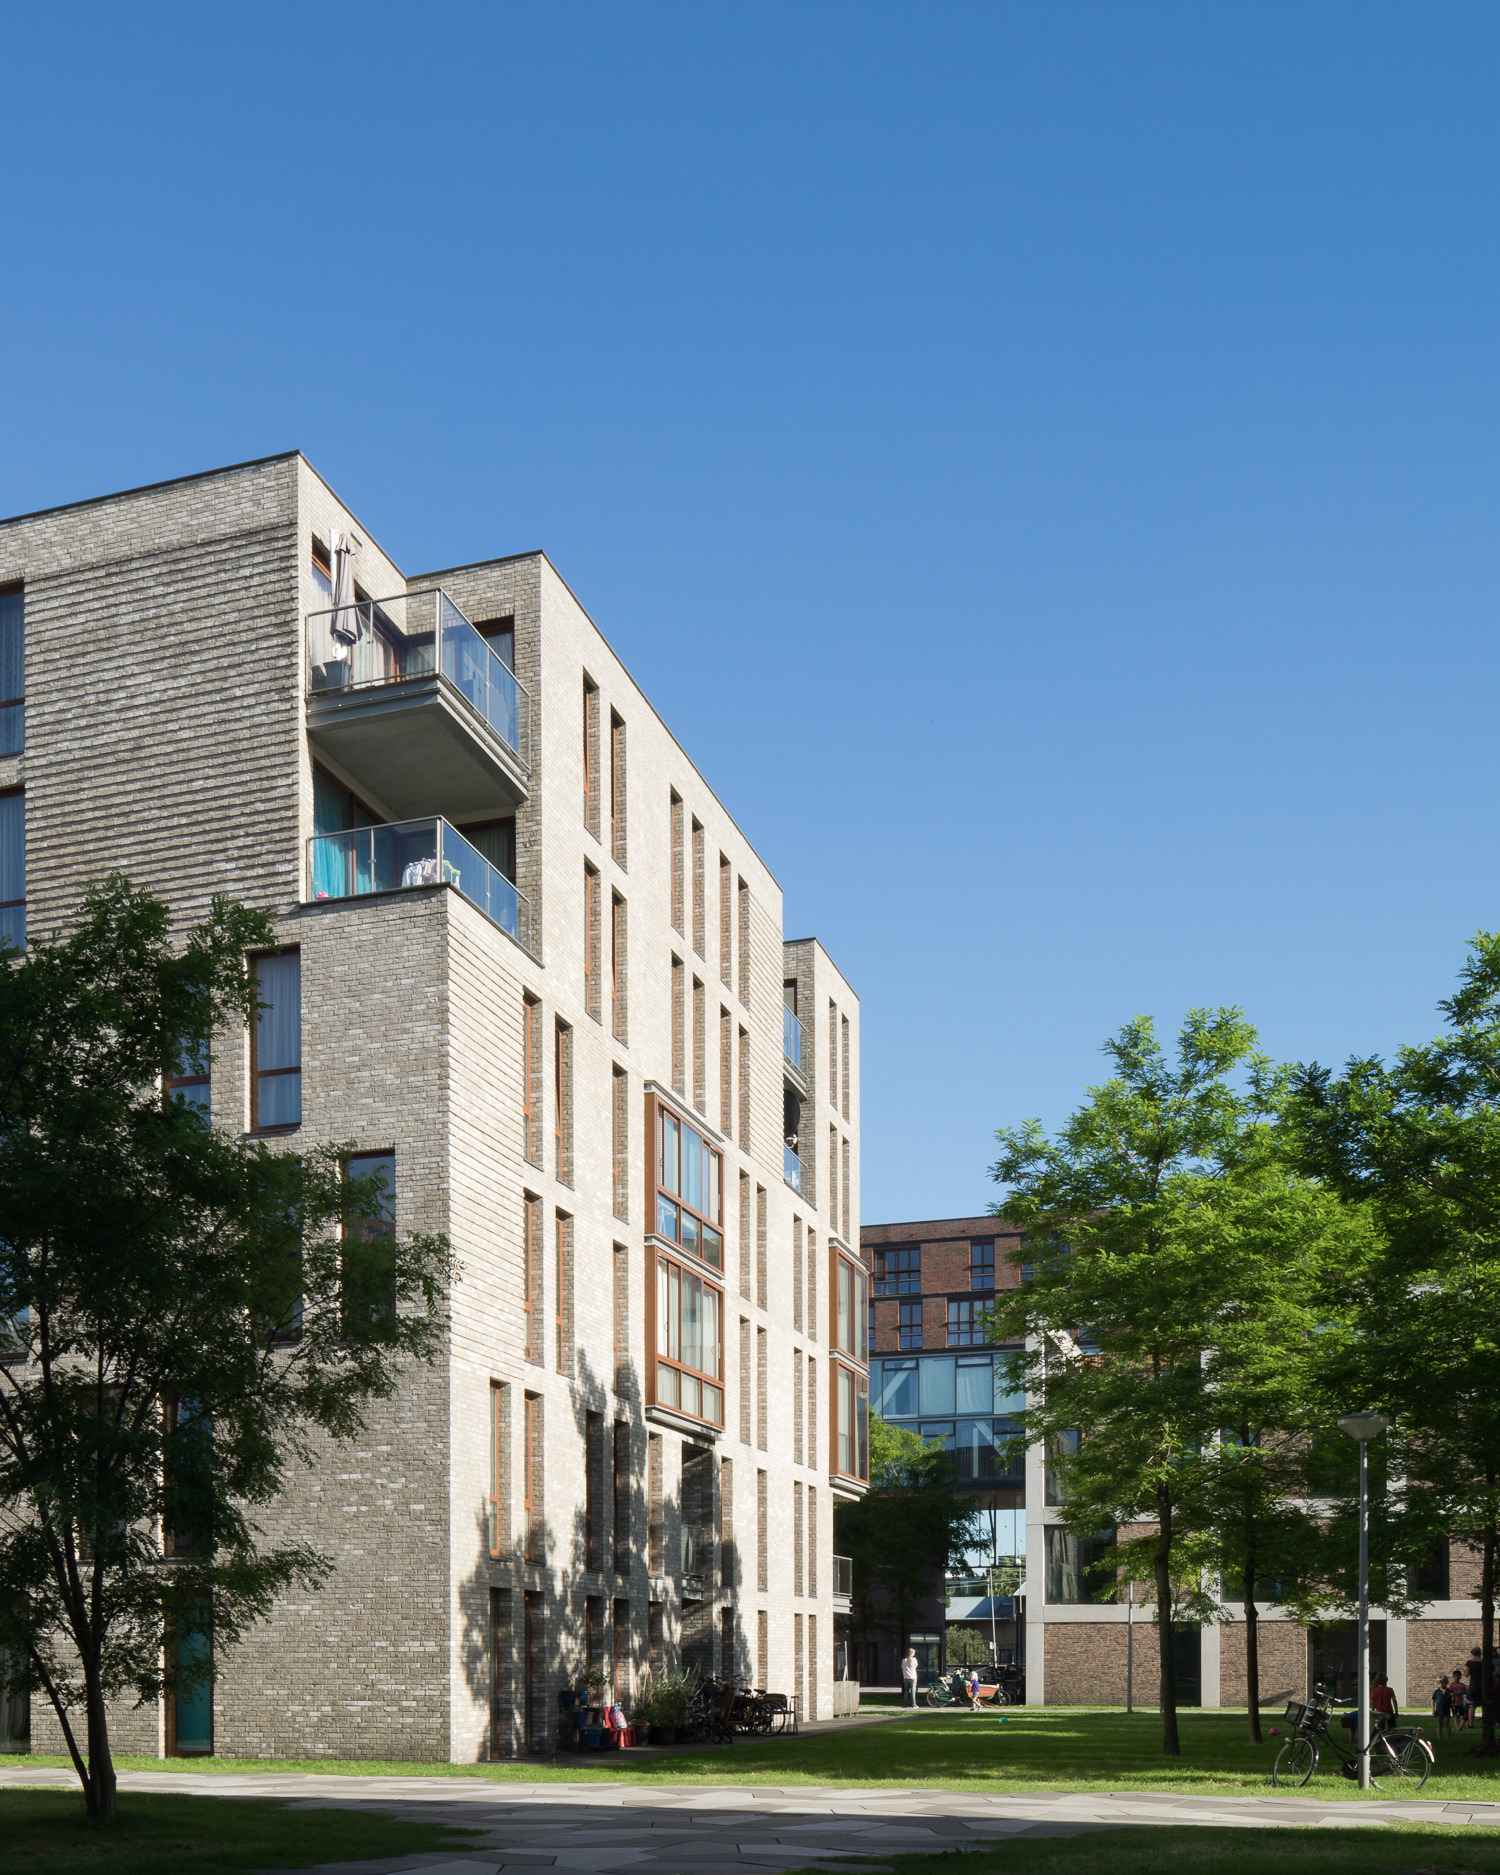 amsterdam-modern-architecture-facade-het-funen-mark-hadden-photography-architectuurfotograaf-123.jpg